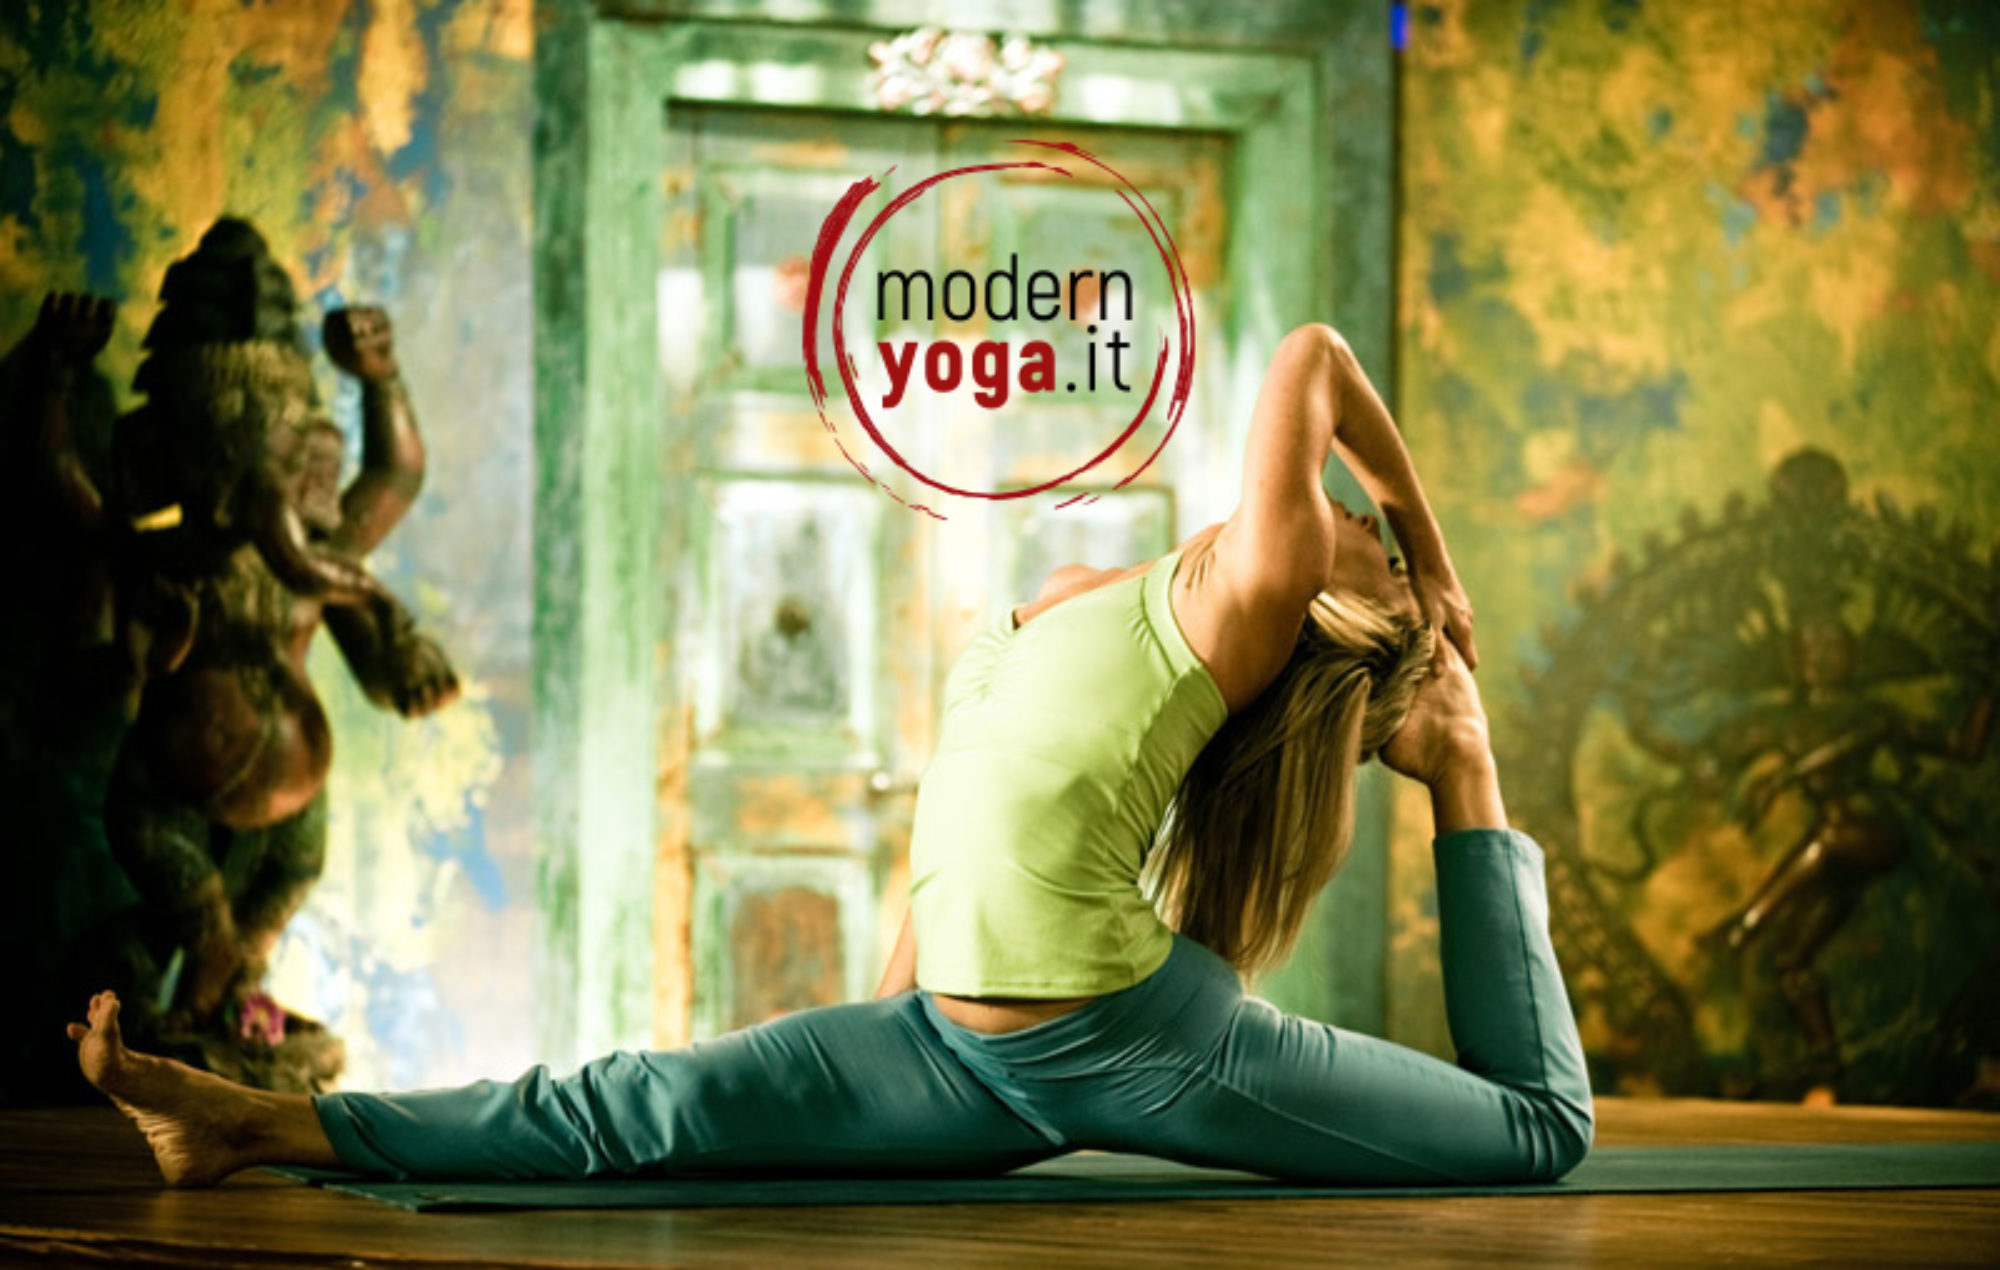 Yoga Rimini, Ashtanga Yoga, Vinyasa Flow-Power Yoga rimini -riccione,Ferrara, Ravenna,san marino, Rovigo, Bologna